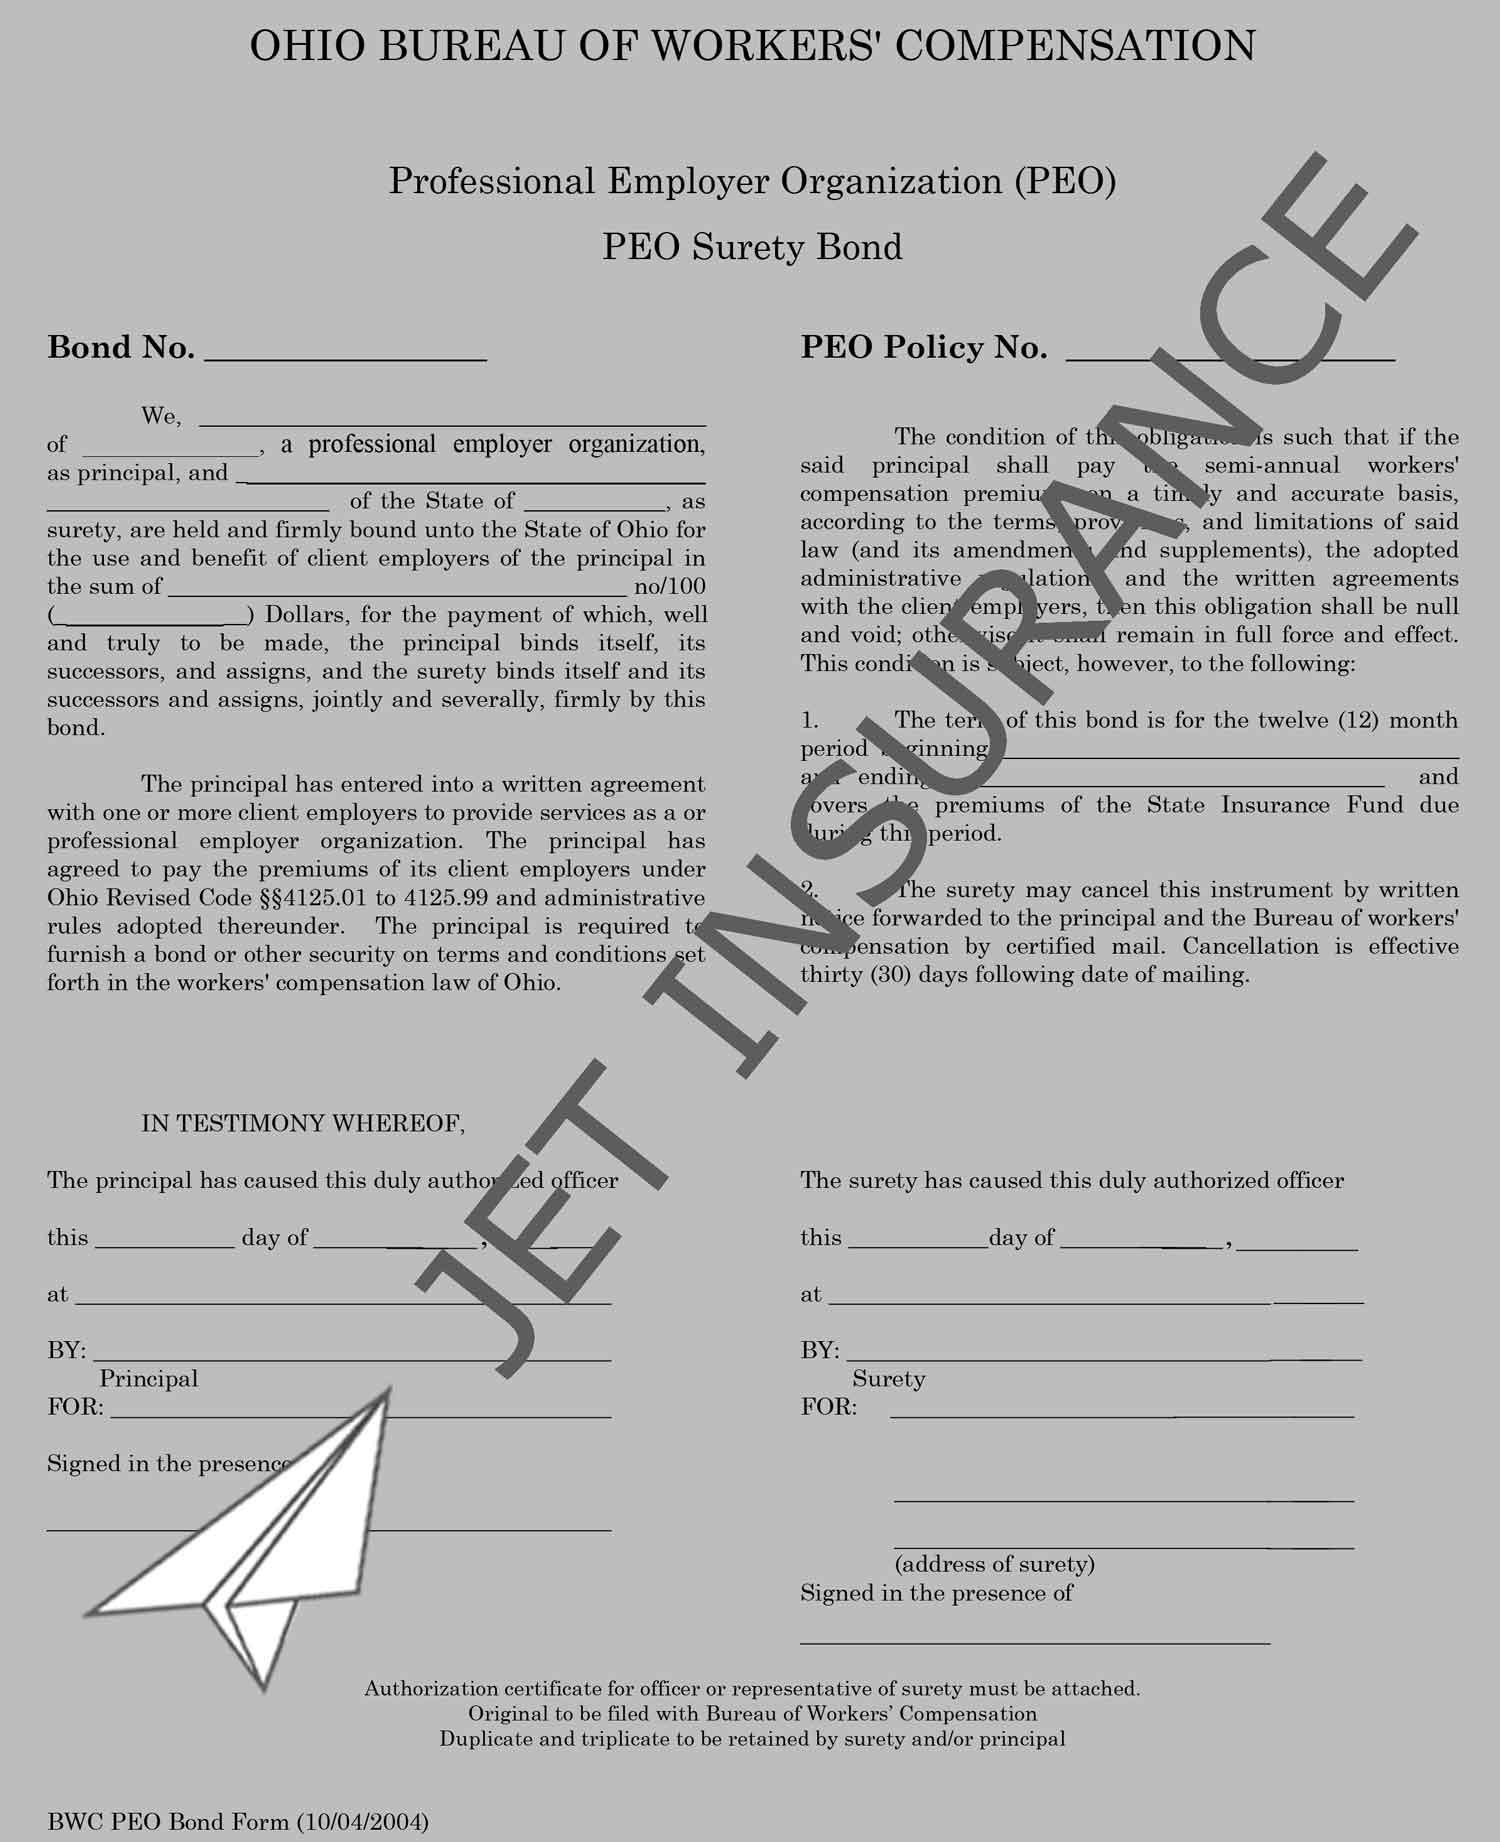 Ohio Professional Employer Organization Bond Form